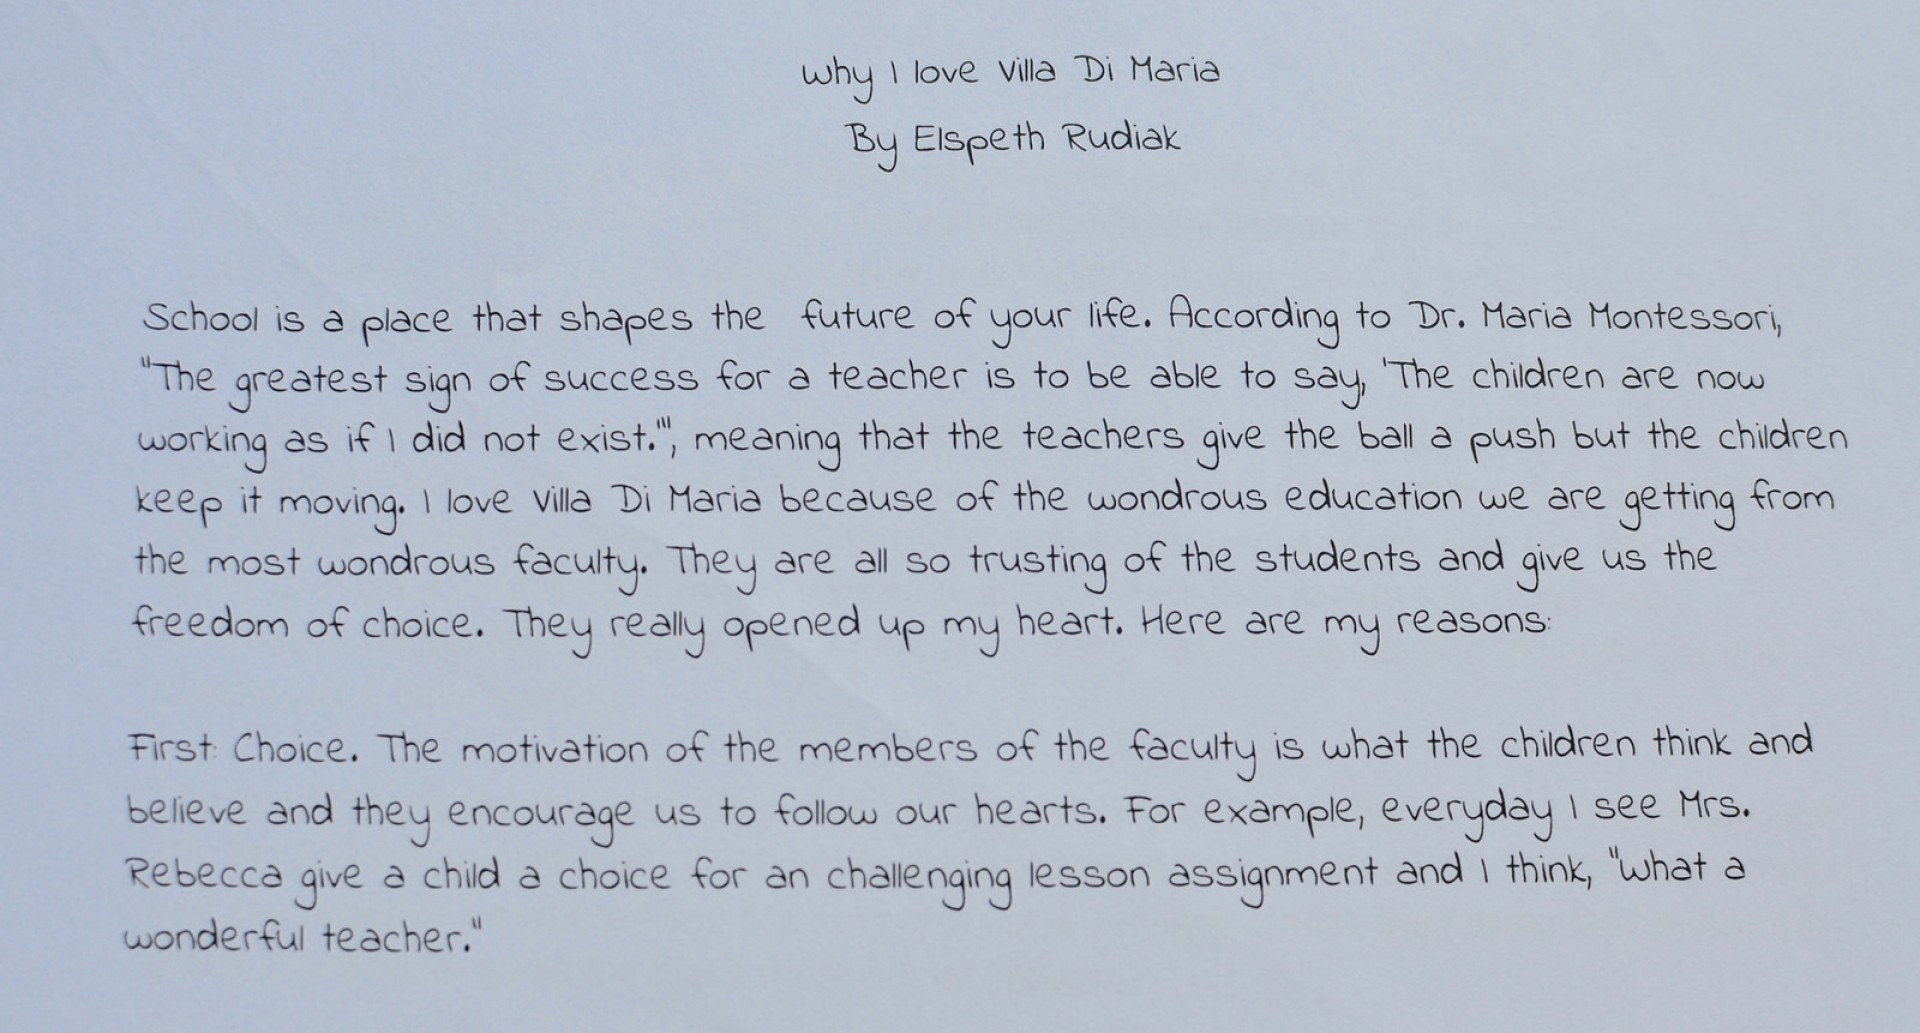 009 Essay Example My School 41204544975 662945095a H Amazing Dream For Class 10 In Urdu 1 3 Marathi 1920